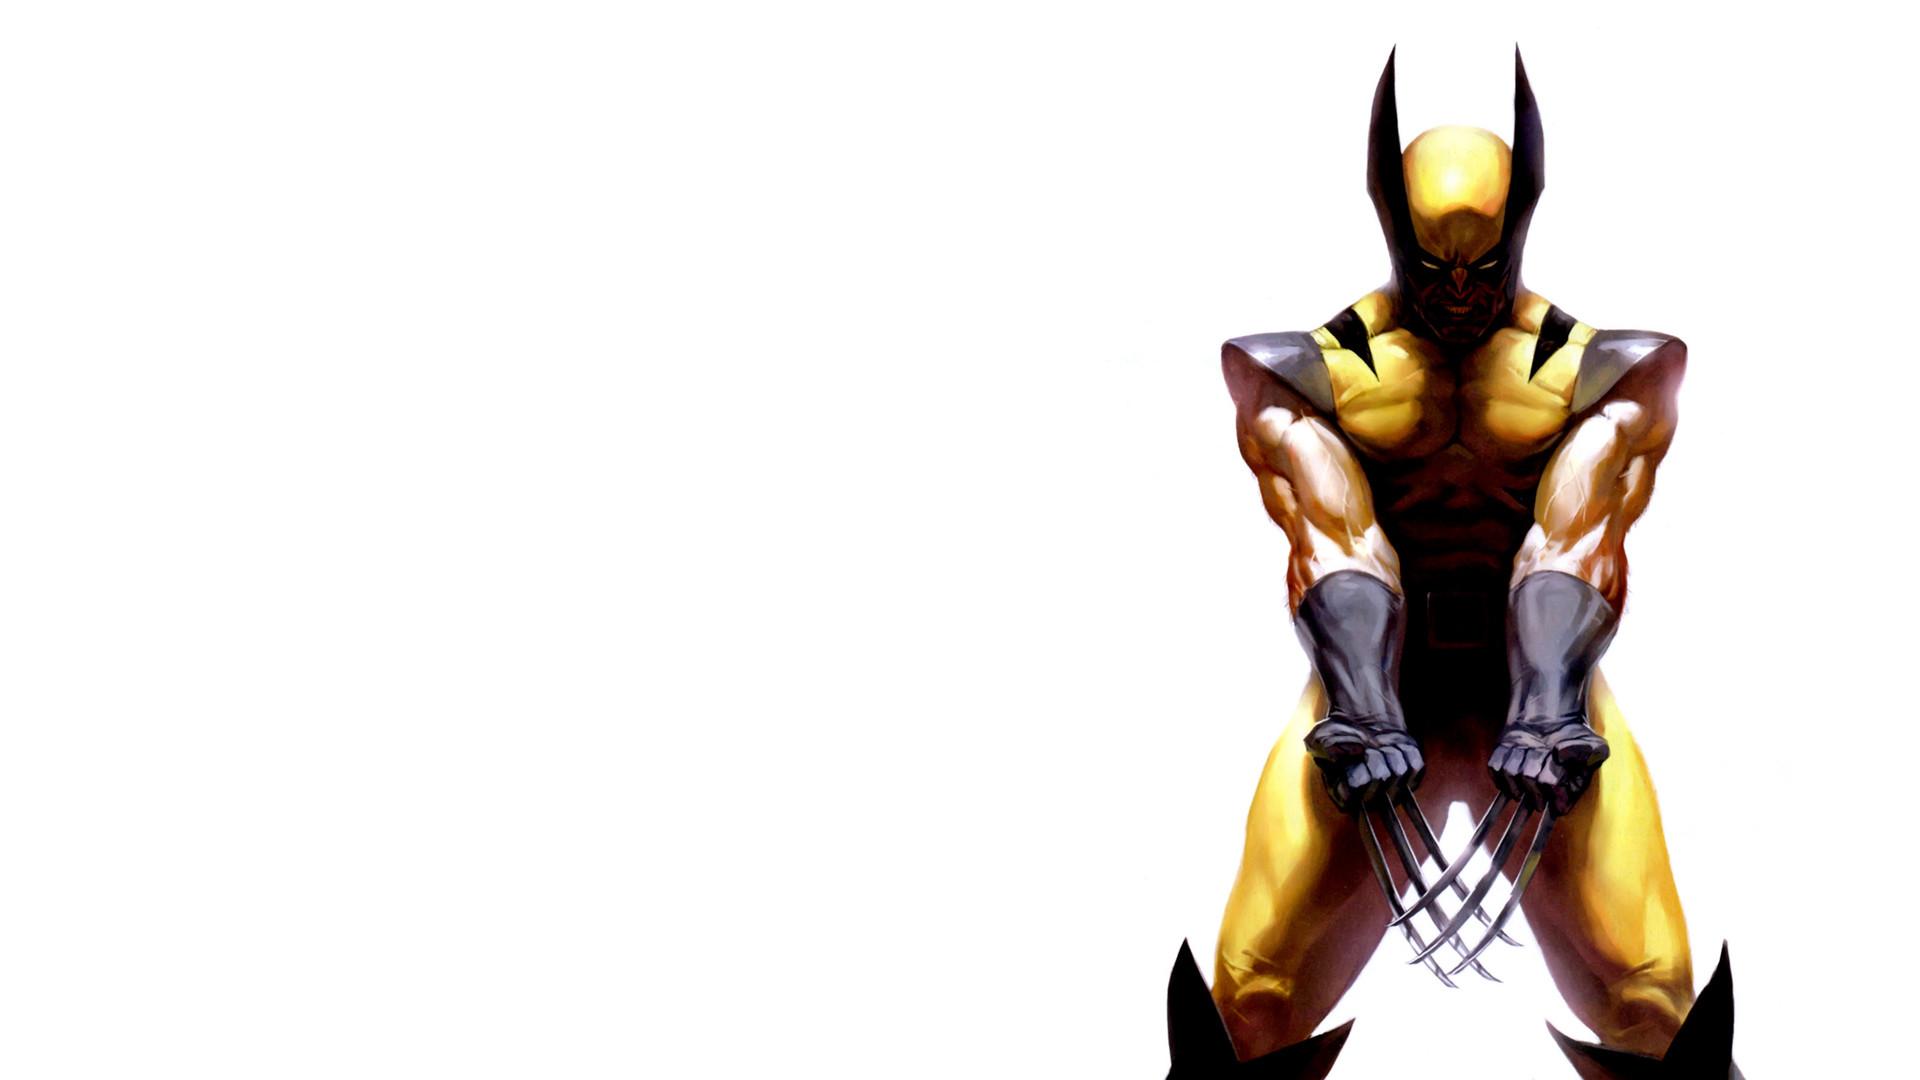 Wolverine HD Wallpapers for desktop download 1920×1200 Wolverine Pictures  Wallpapers (46 Wallpapers) | Adorable Wallpapers | Wallpapers | Pinterest  …